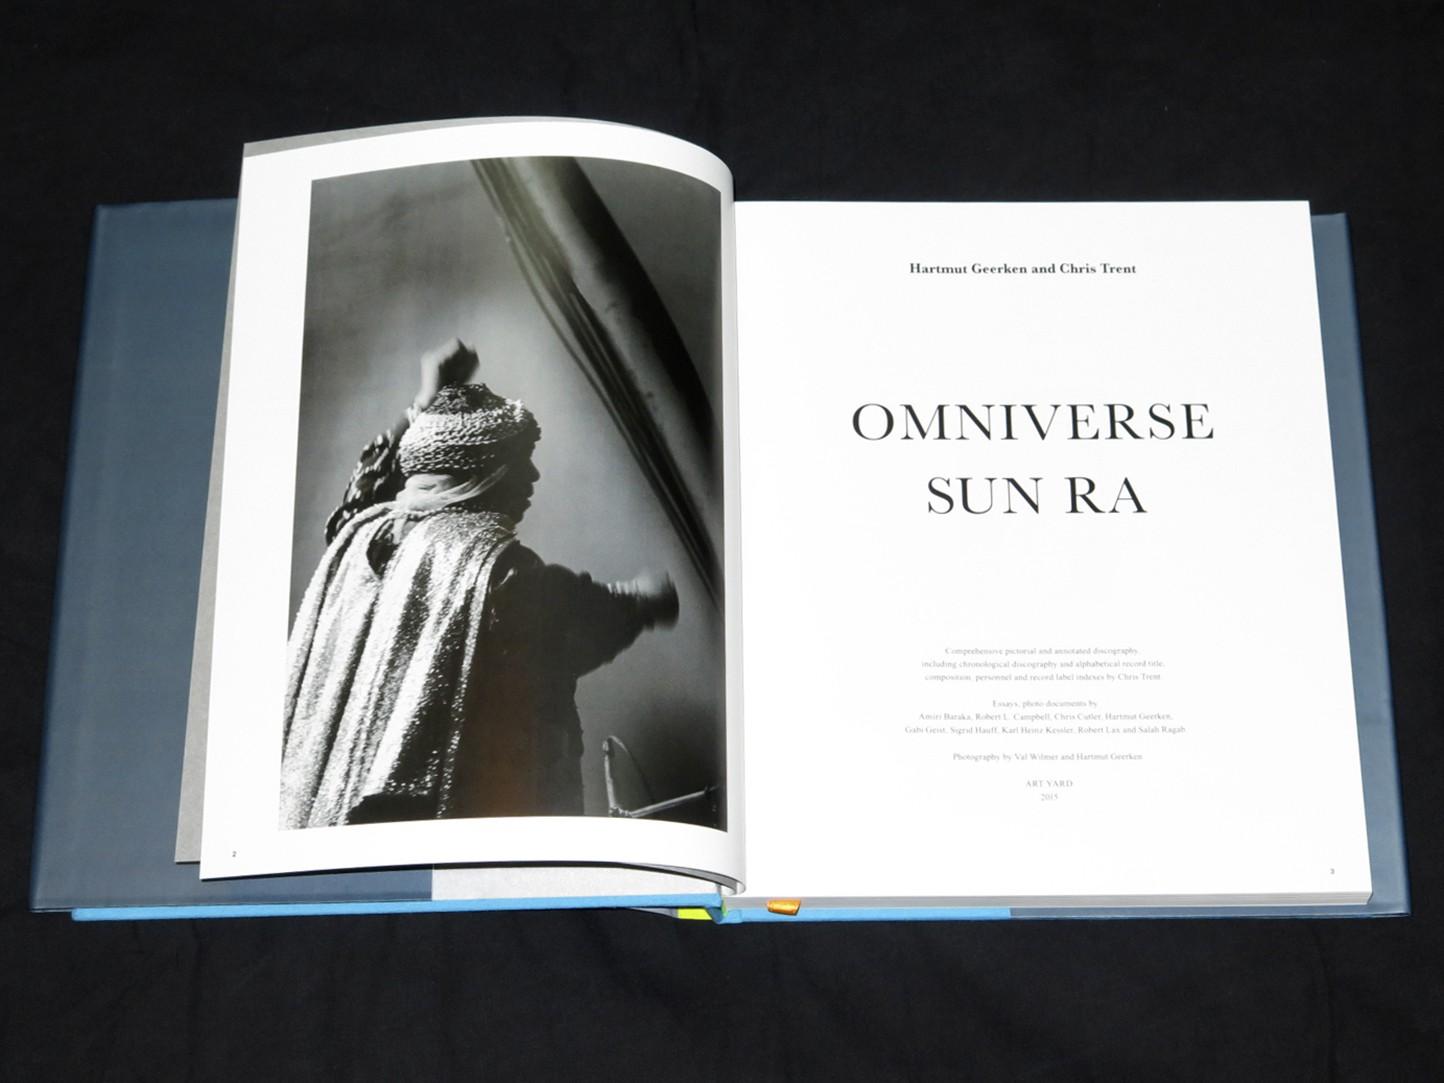 HARTMUT GEERKEN AND CHRIS TRENT - OMNIVERSE SUN RA : BOOK gallery 1